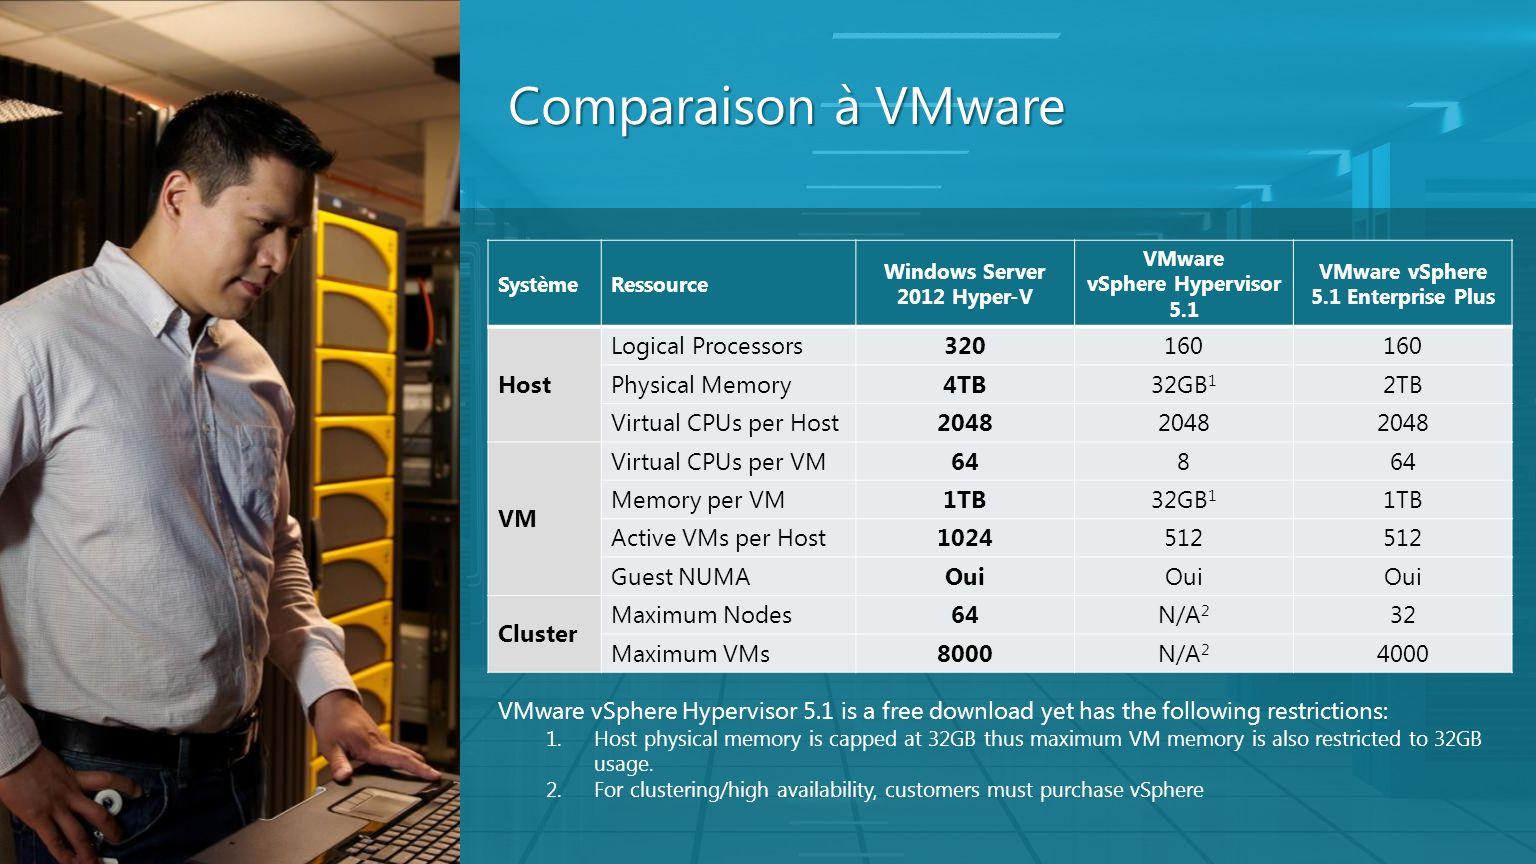 Comparaison à VMware SystèmeRessource Windows Server 2012 Hyper-V VMware vSphere Hypervisor 5.1 VMware vSphere 5.1 Enterprise Plus Host Logical Proces